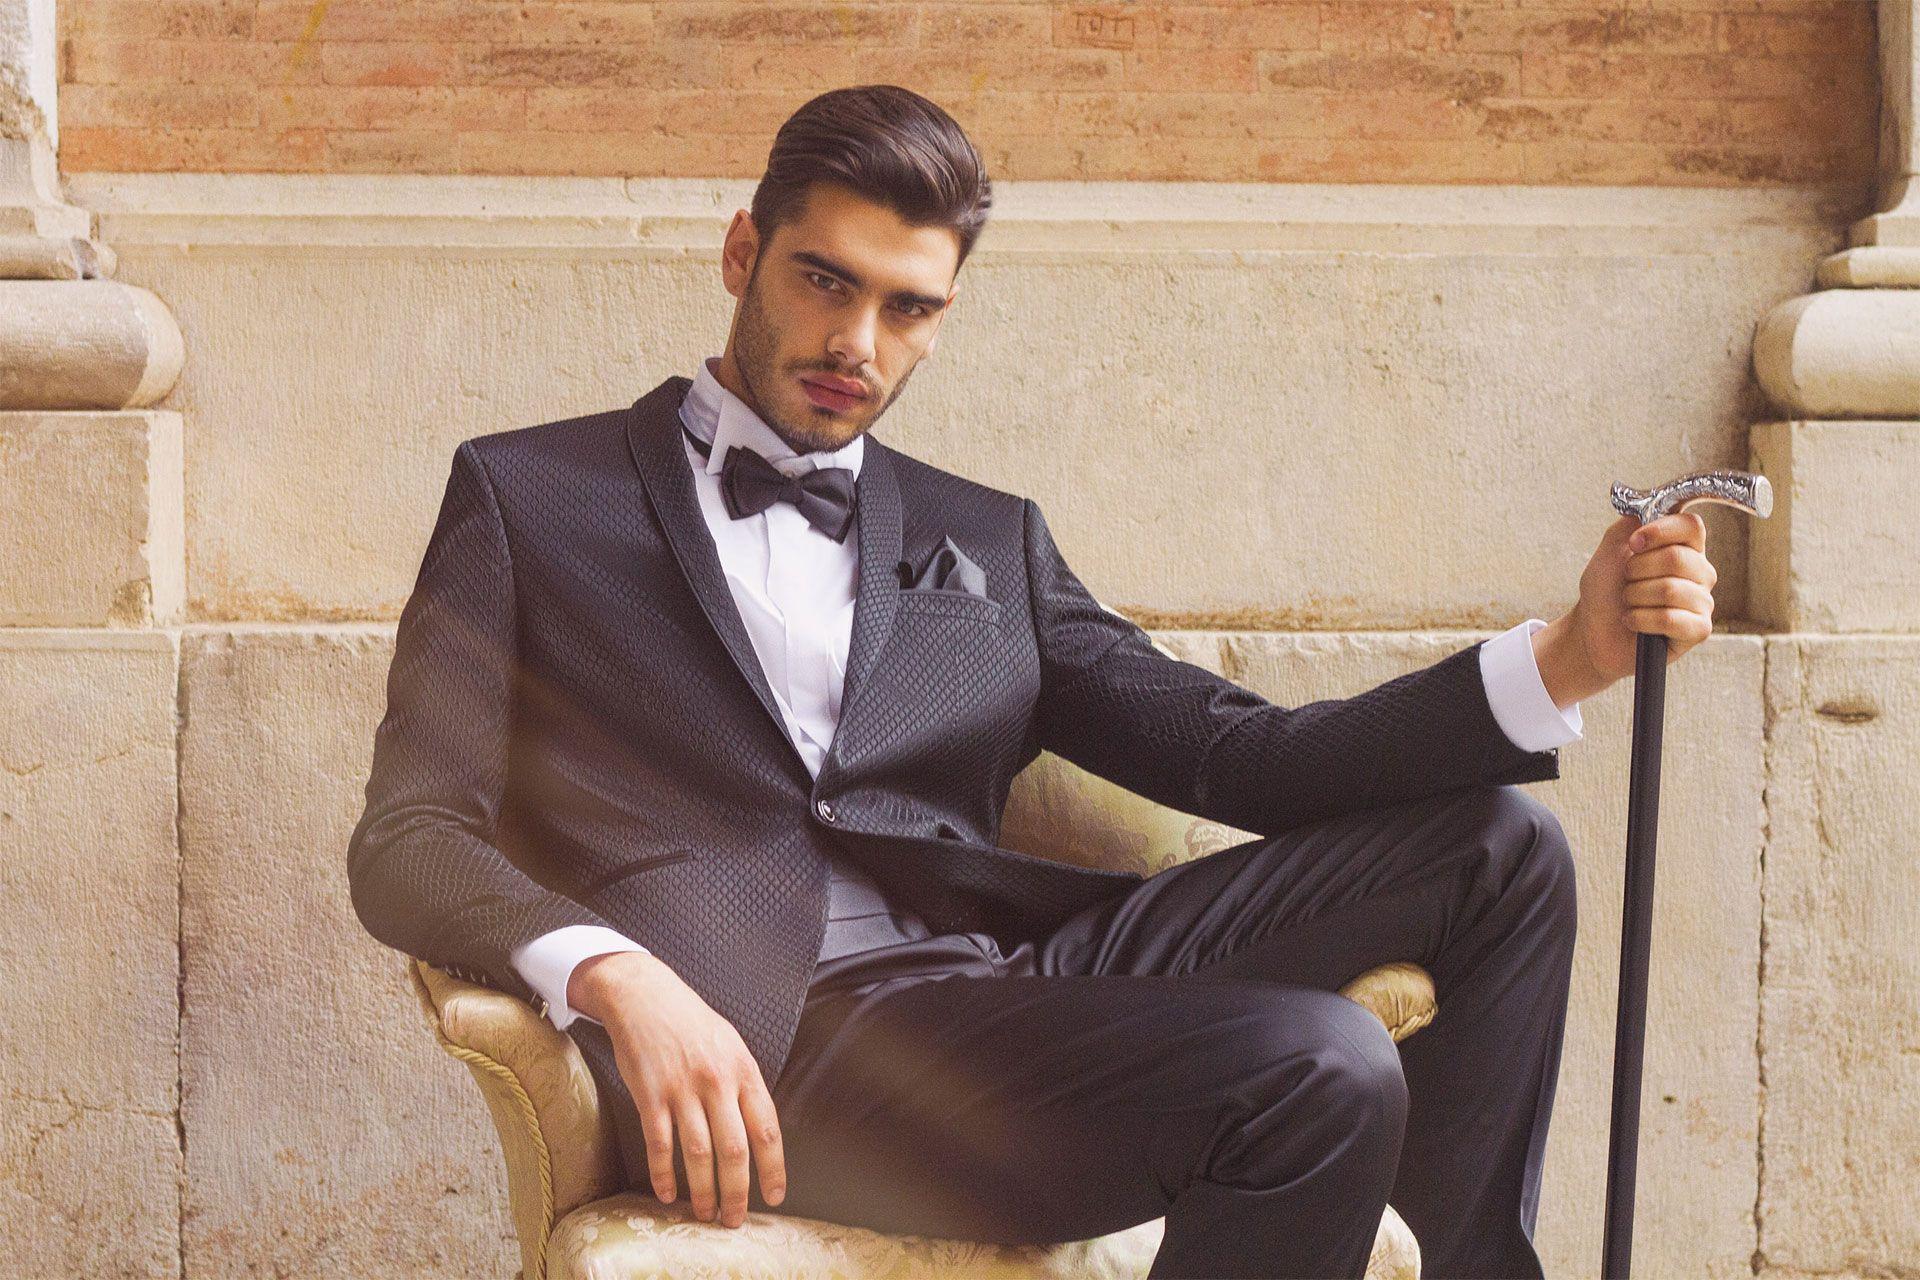 Pin by raffa servidati on wedding hair pinterest men dress and